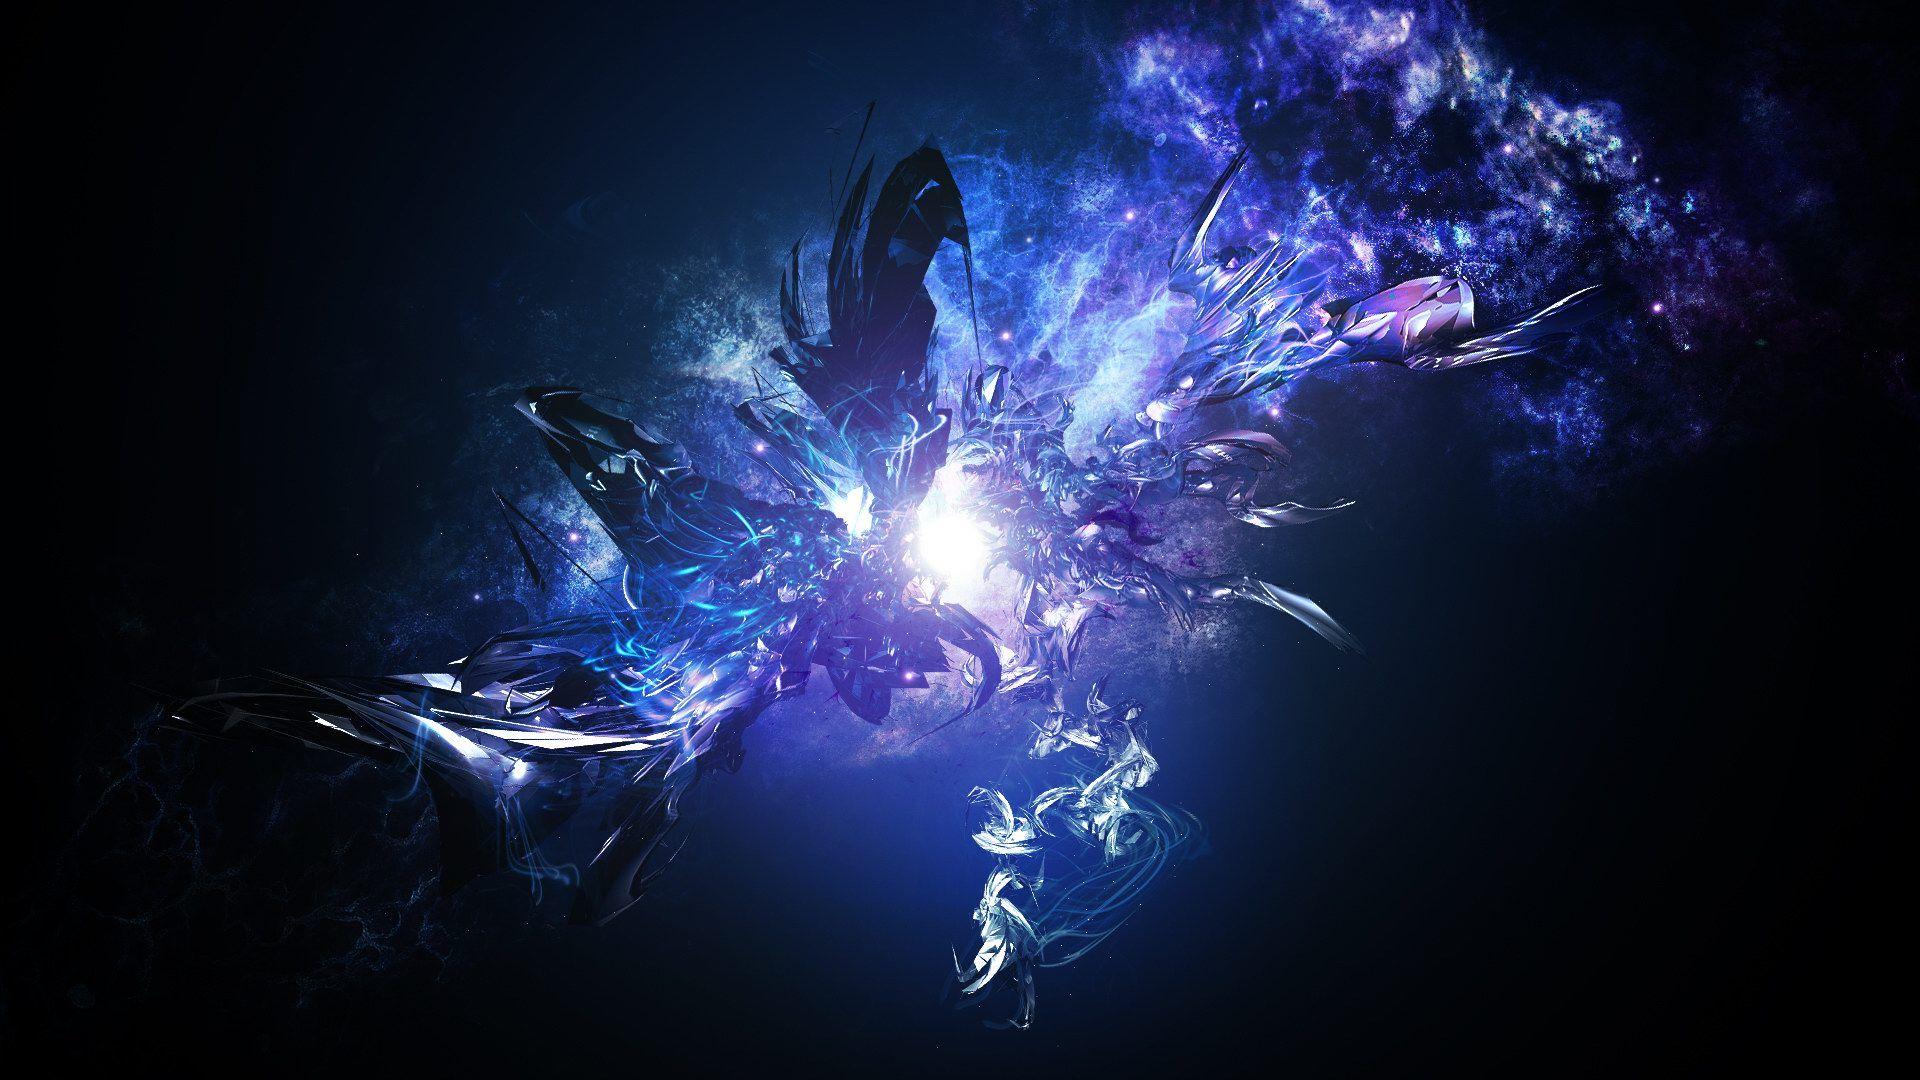 Wonderful Wallpaper Music Trippy - ea3482b80ce0161d433a6fe00288a78f  Pic_452125.jpg